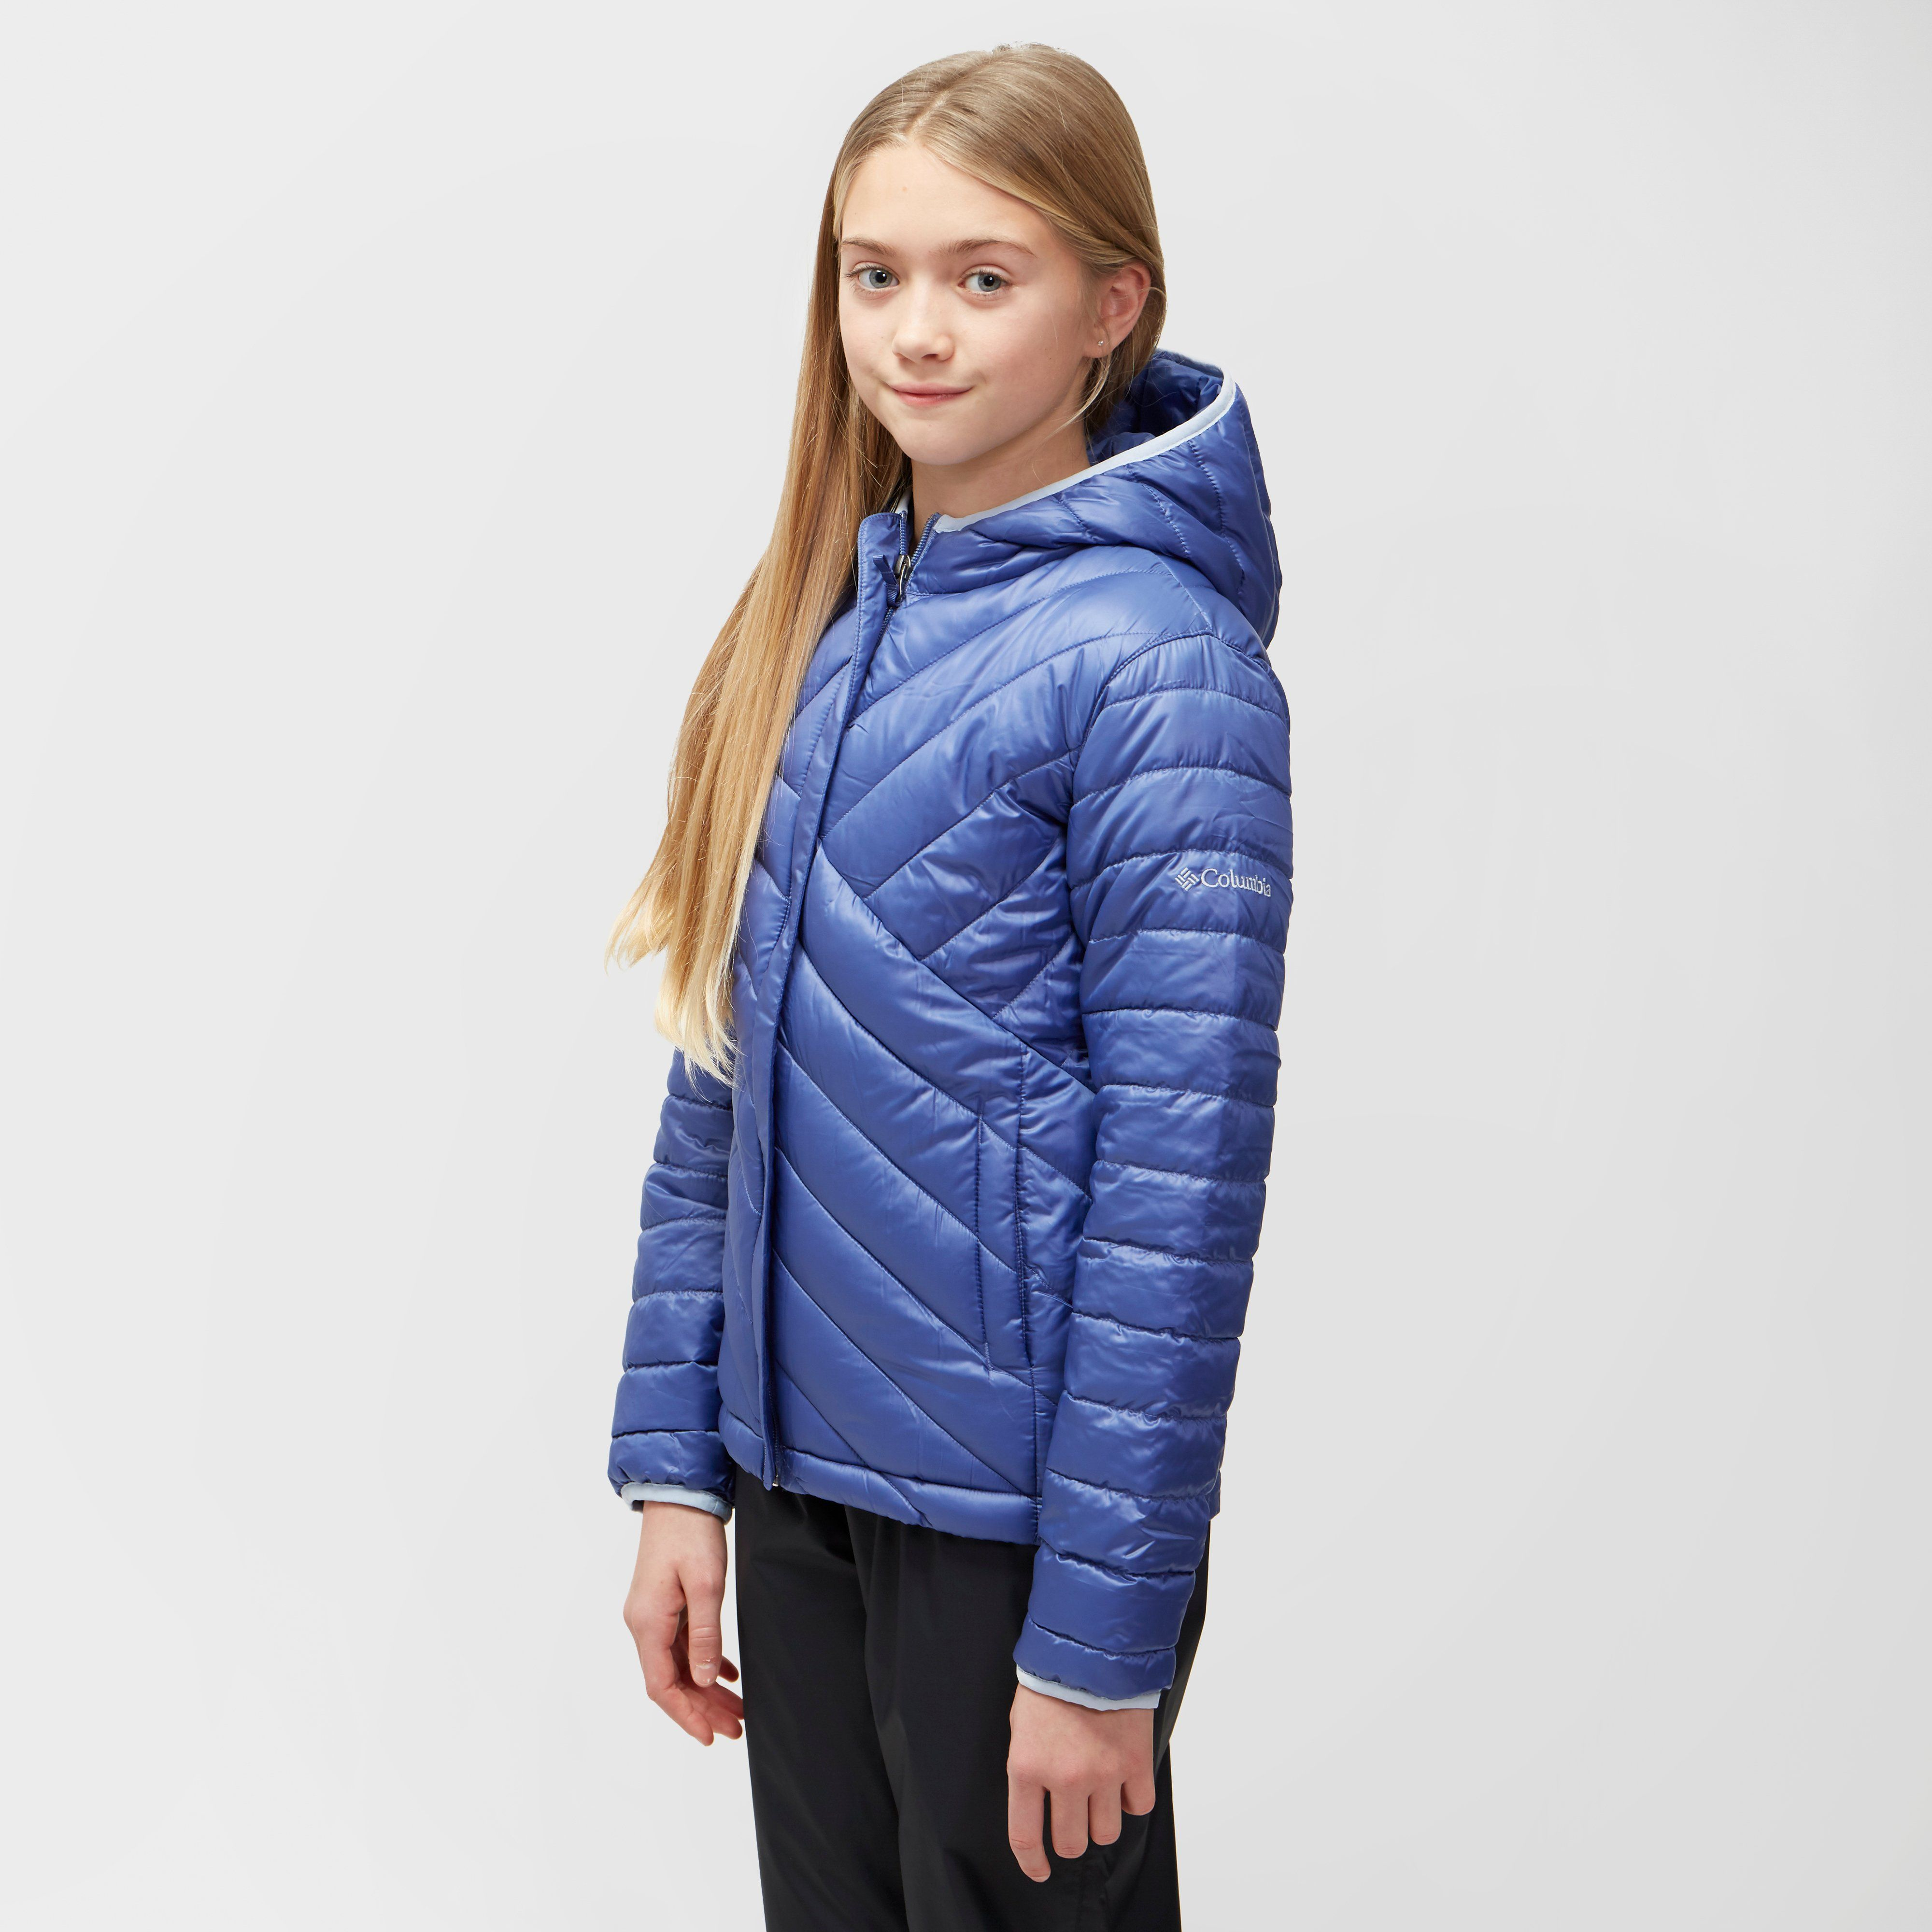 COLUMBIA Girls Powder Lite™ Insulated Jacket